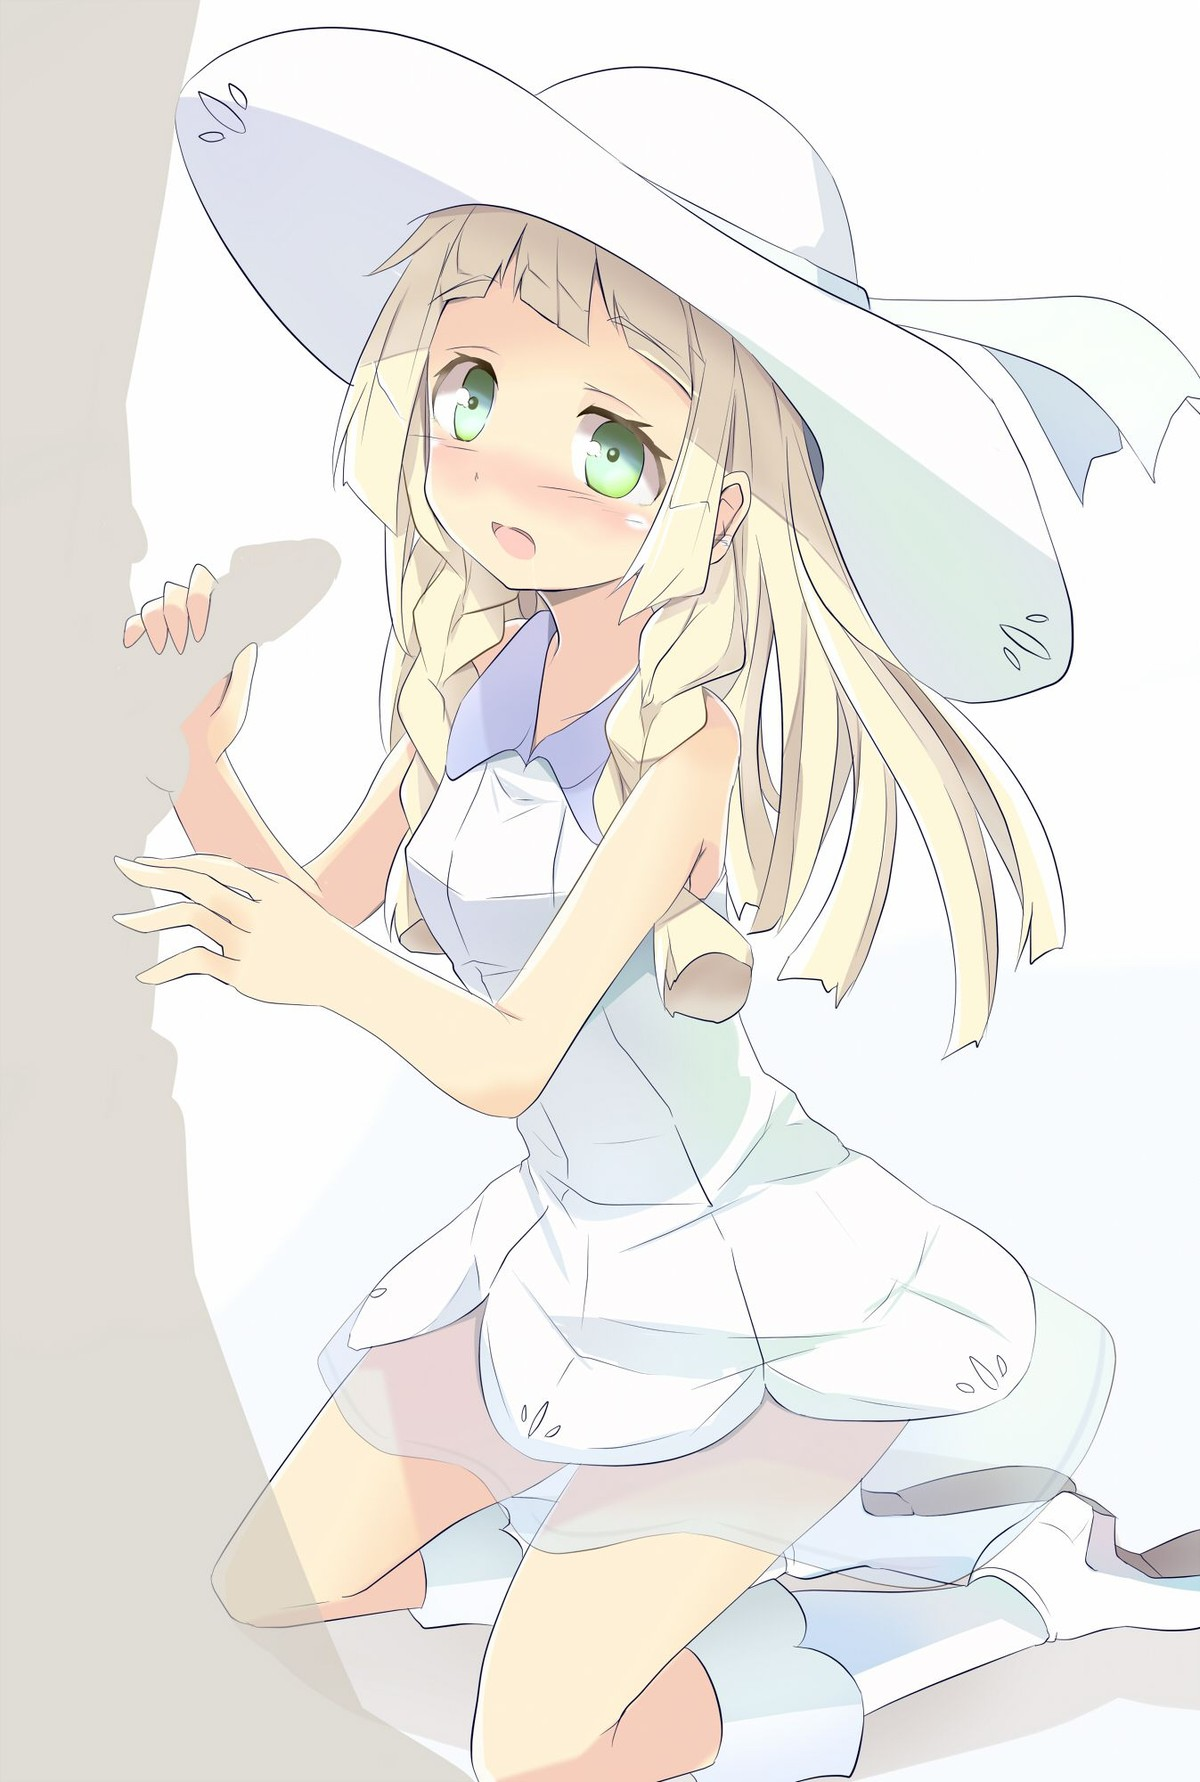 lillie_(pokemon)007